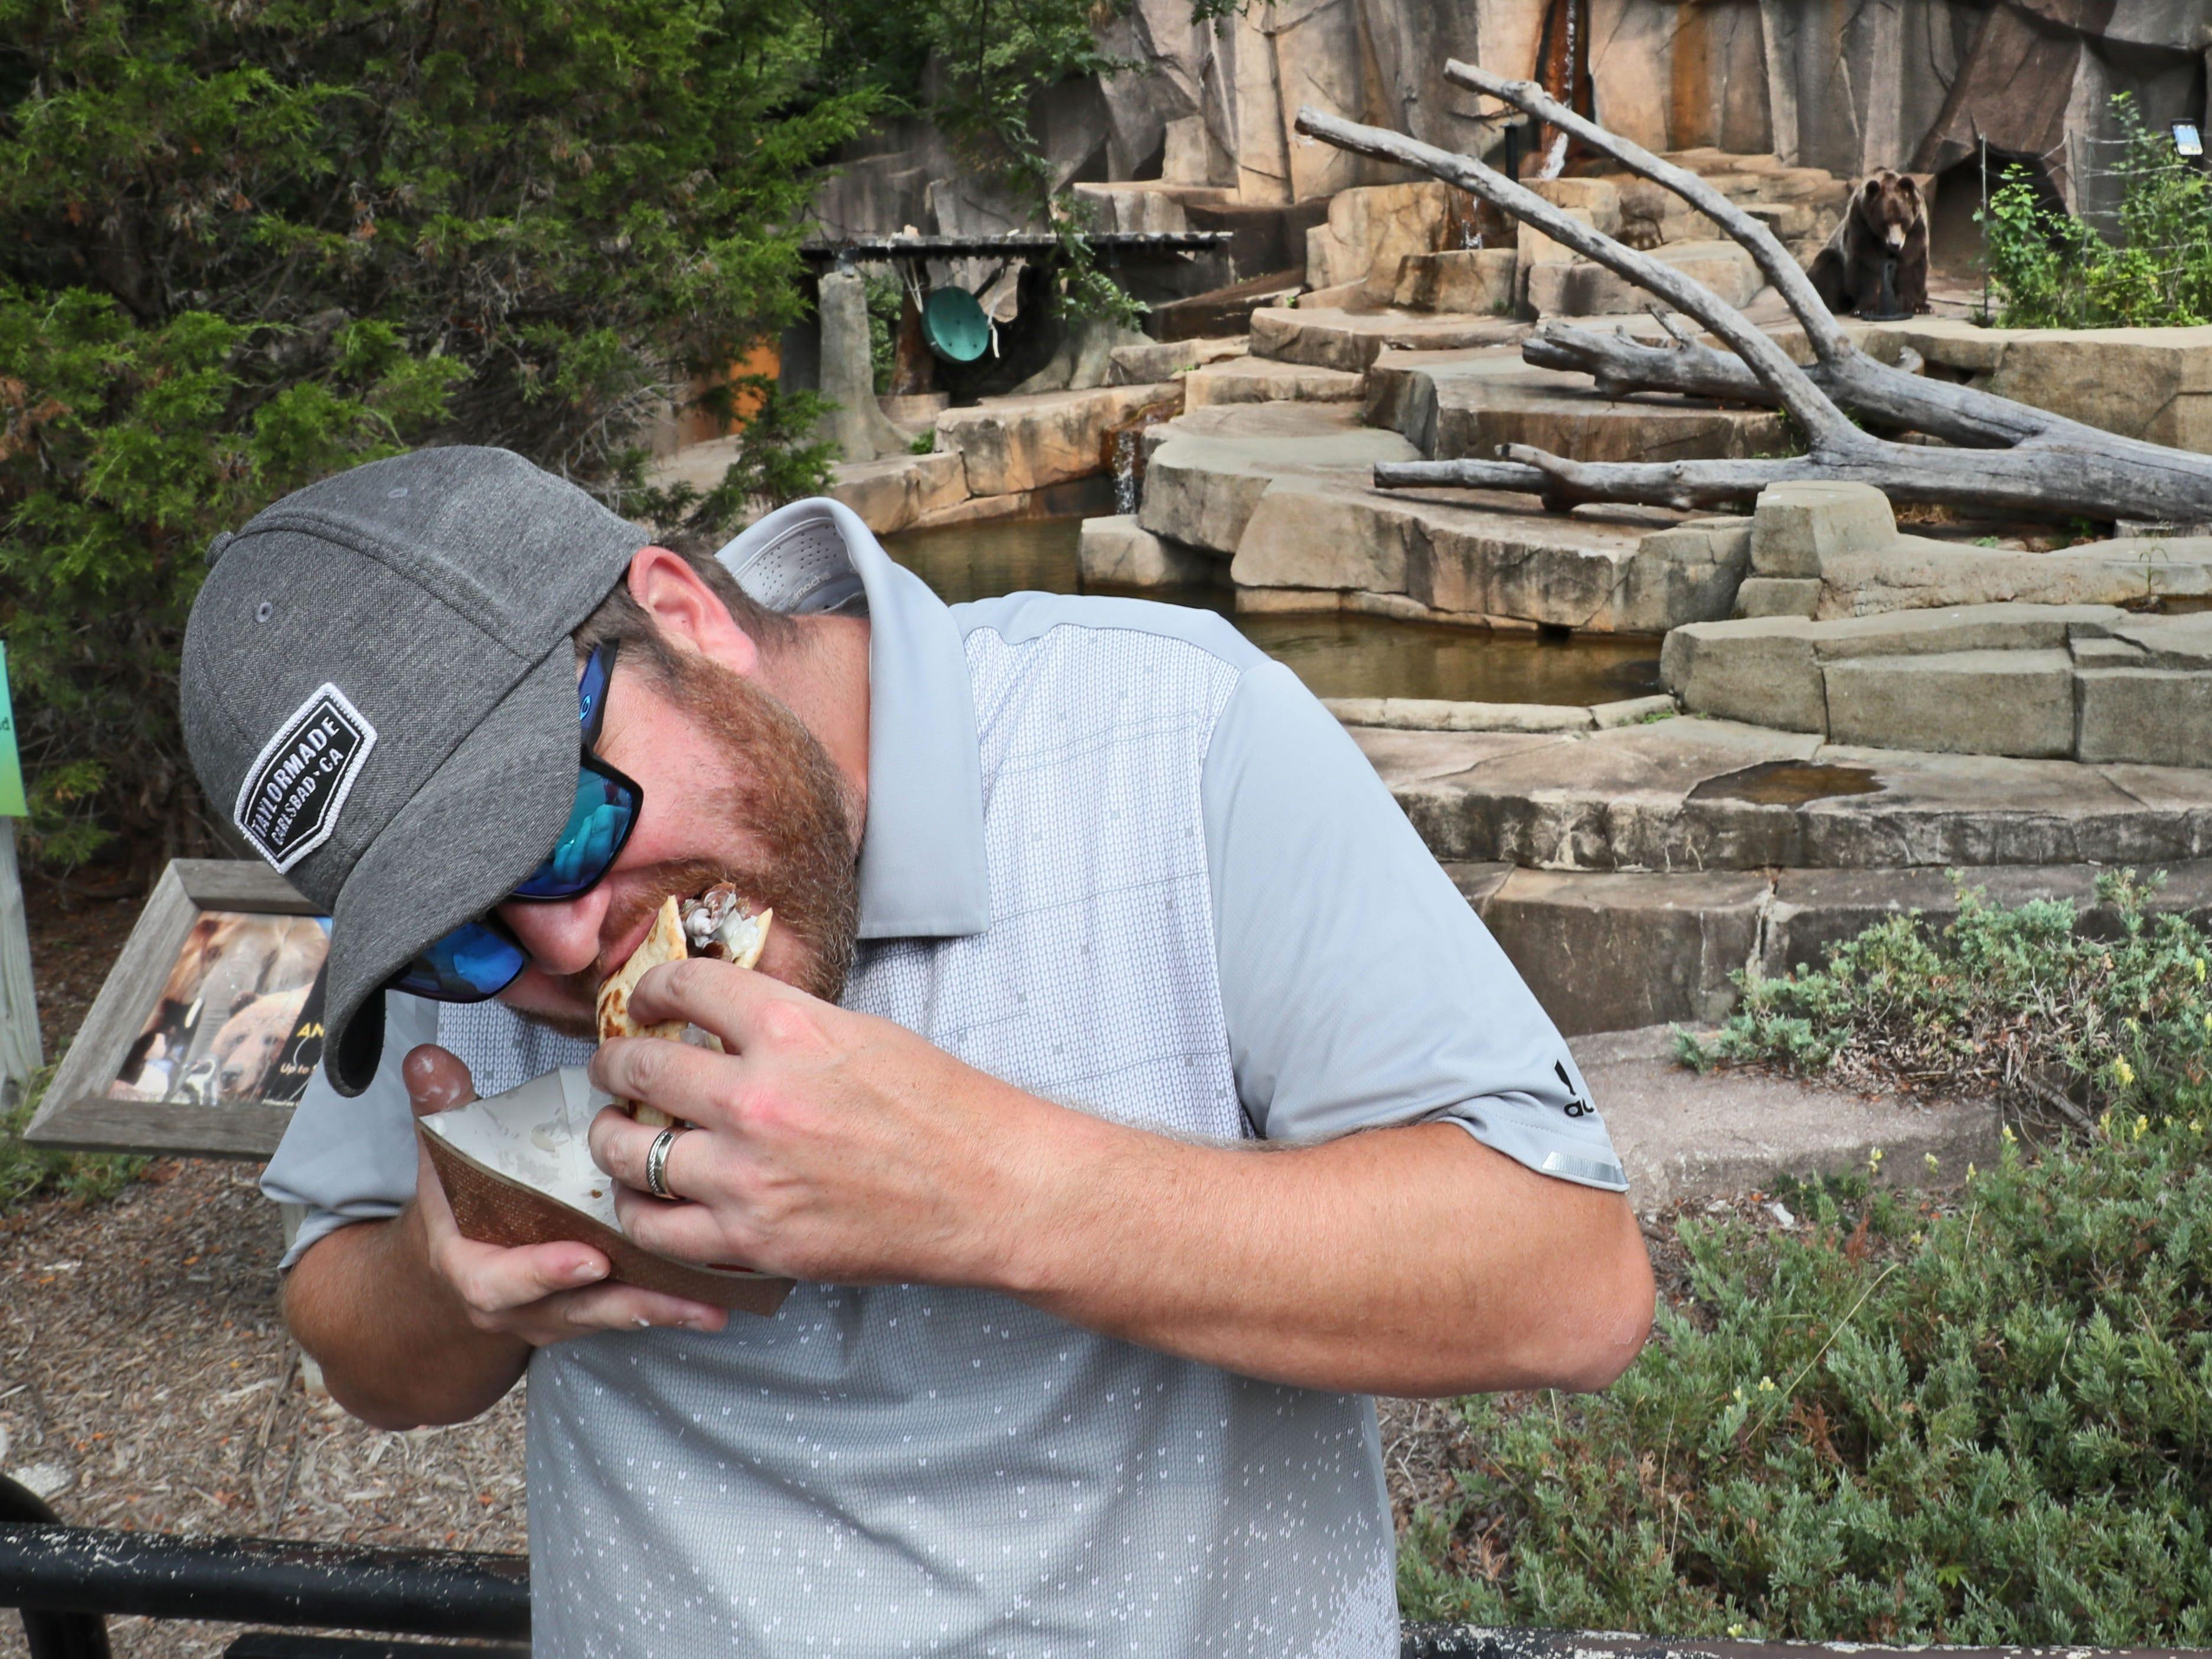 Rob Borden of Johnson Creek eats a gyro sandwich from Aladdin while brown bear Boris at rear right looks on.